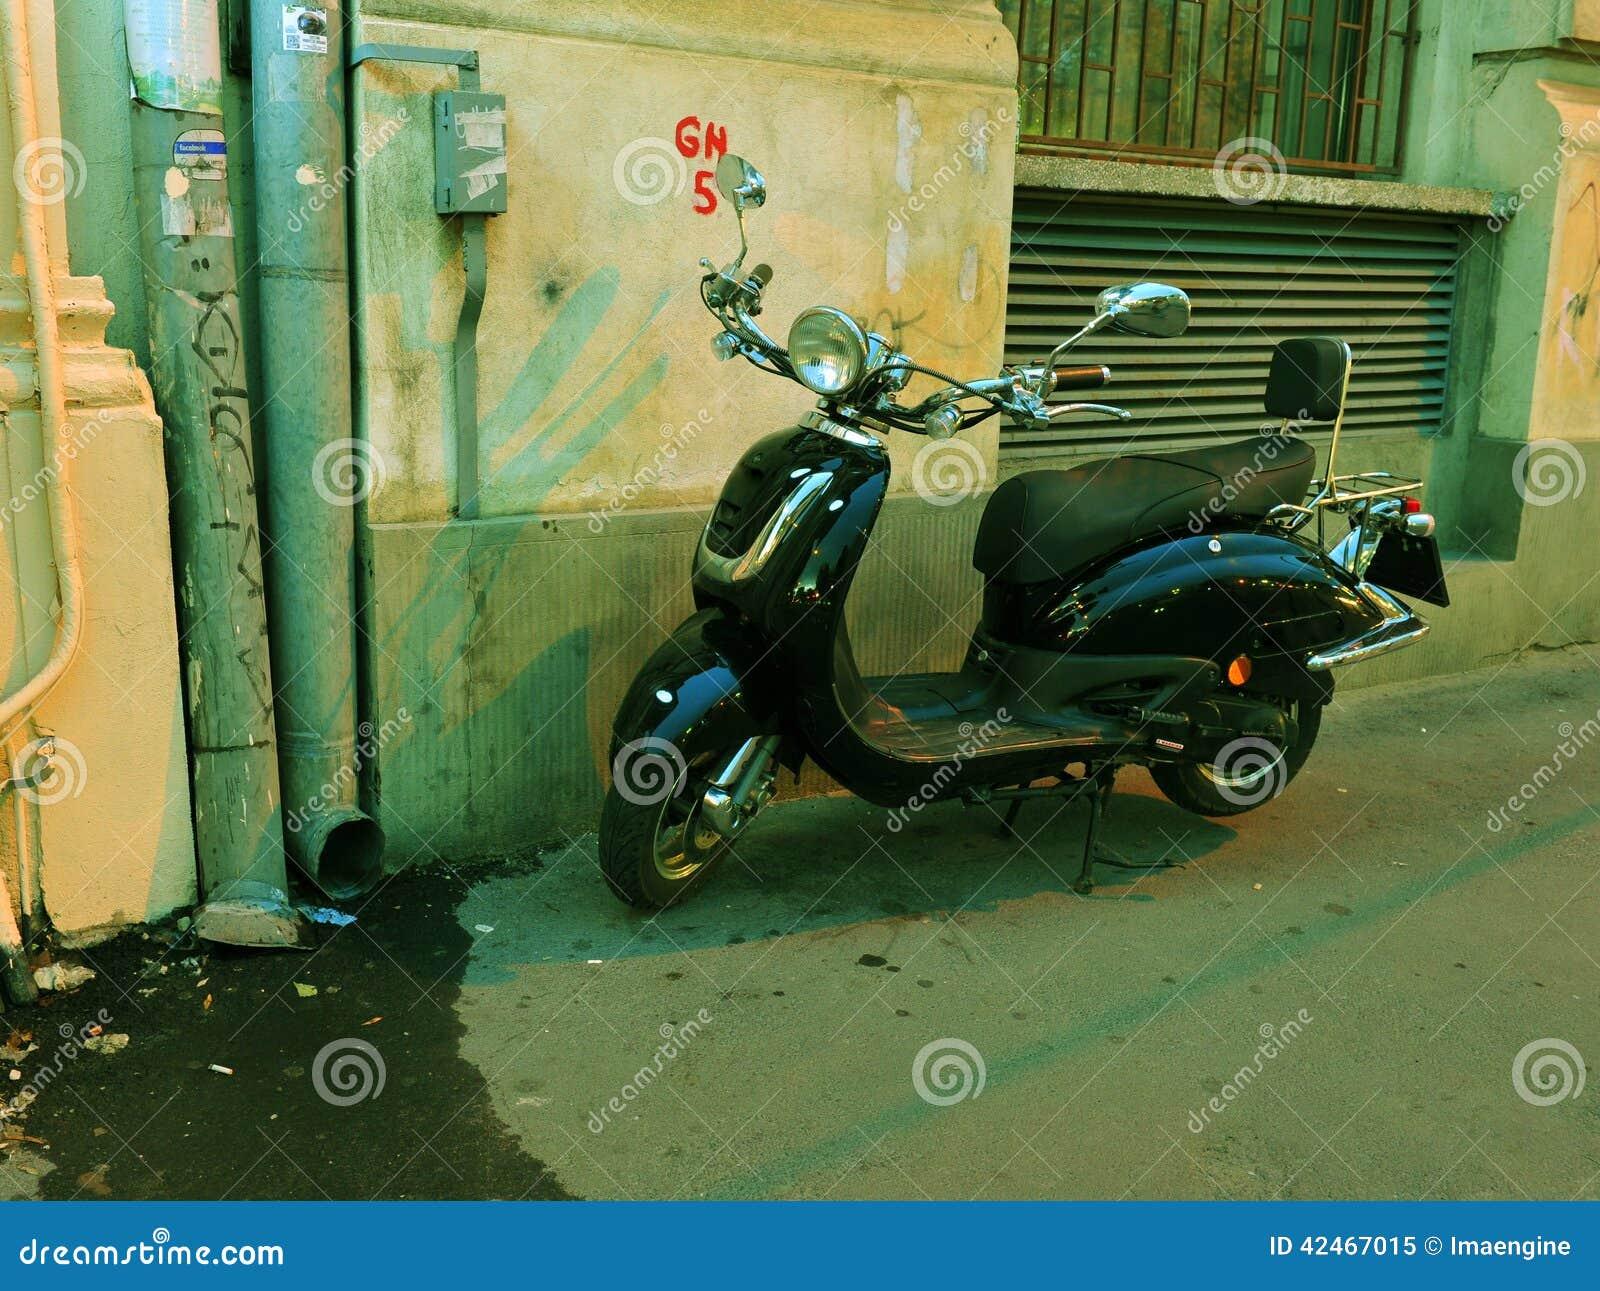 black elegant scooter parked on the sidewalk royalty free stock photography. Black Bedroom Furniture Sets. Home Design Ideas